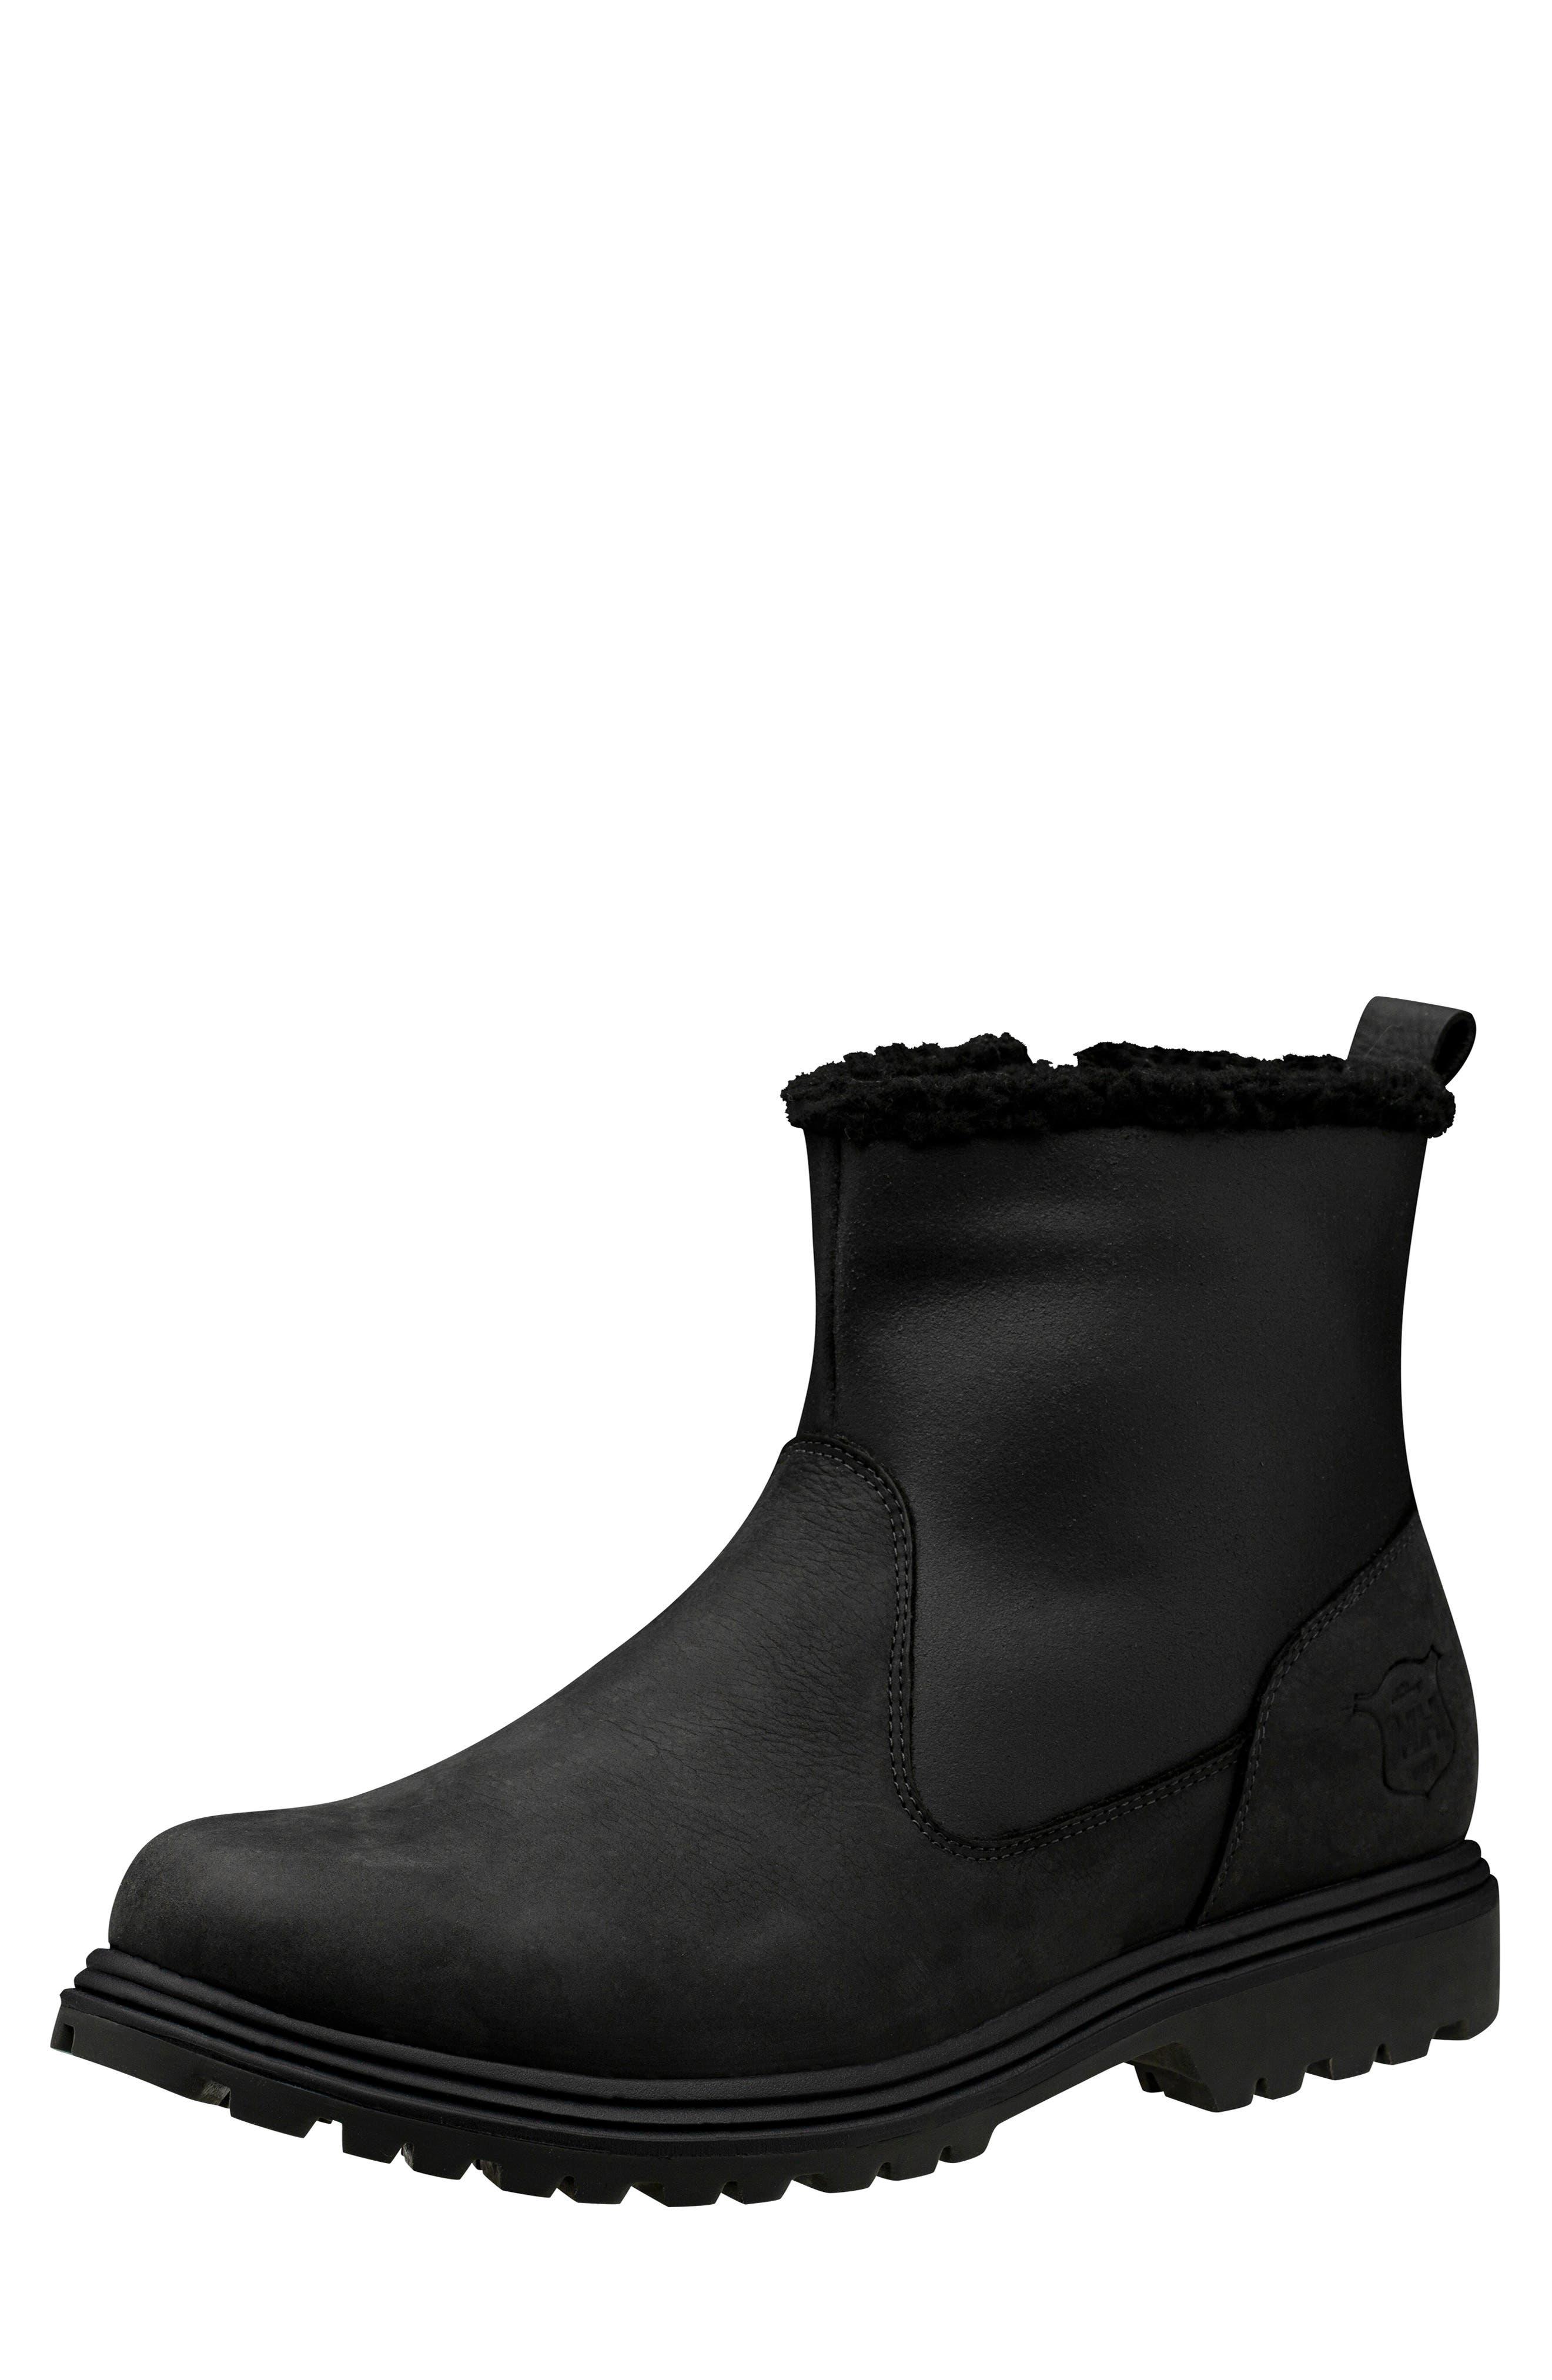 Sherwood Primaloft Waterproof Snow Boot